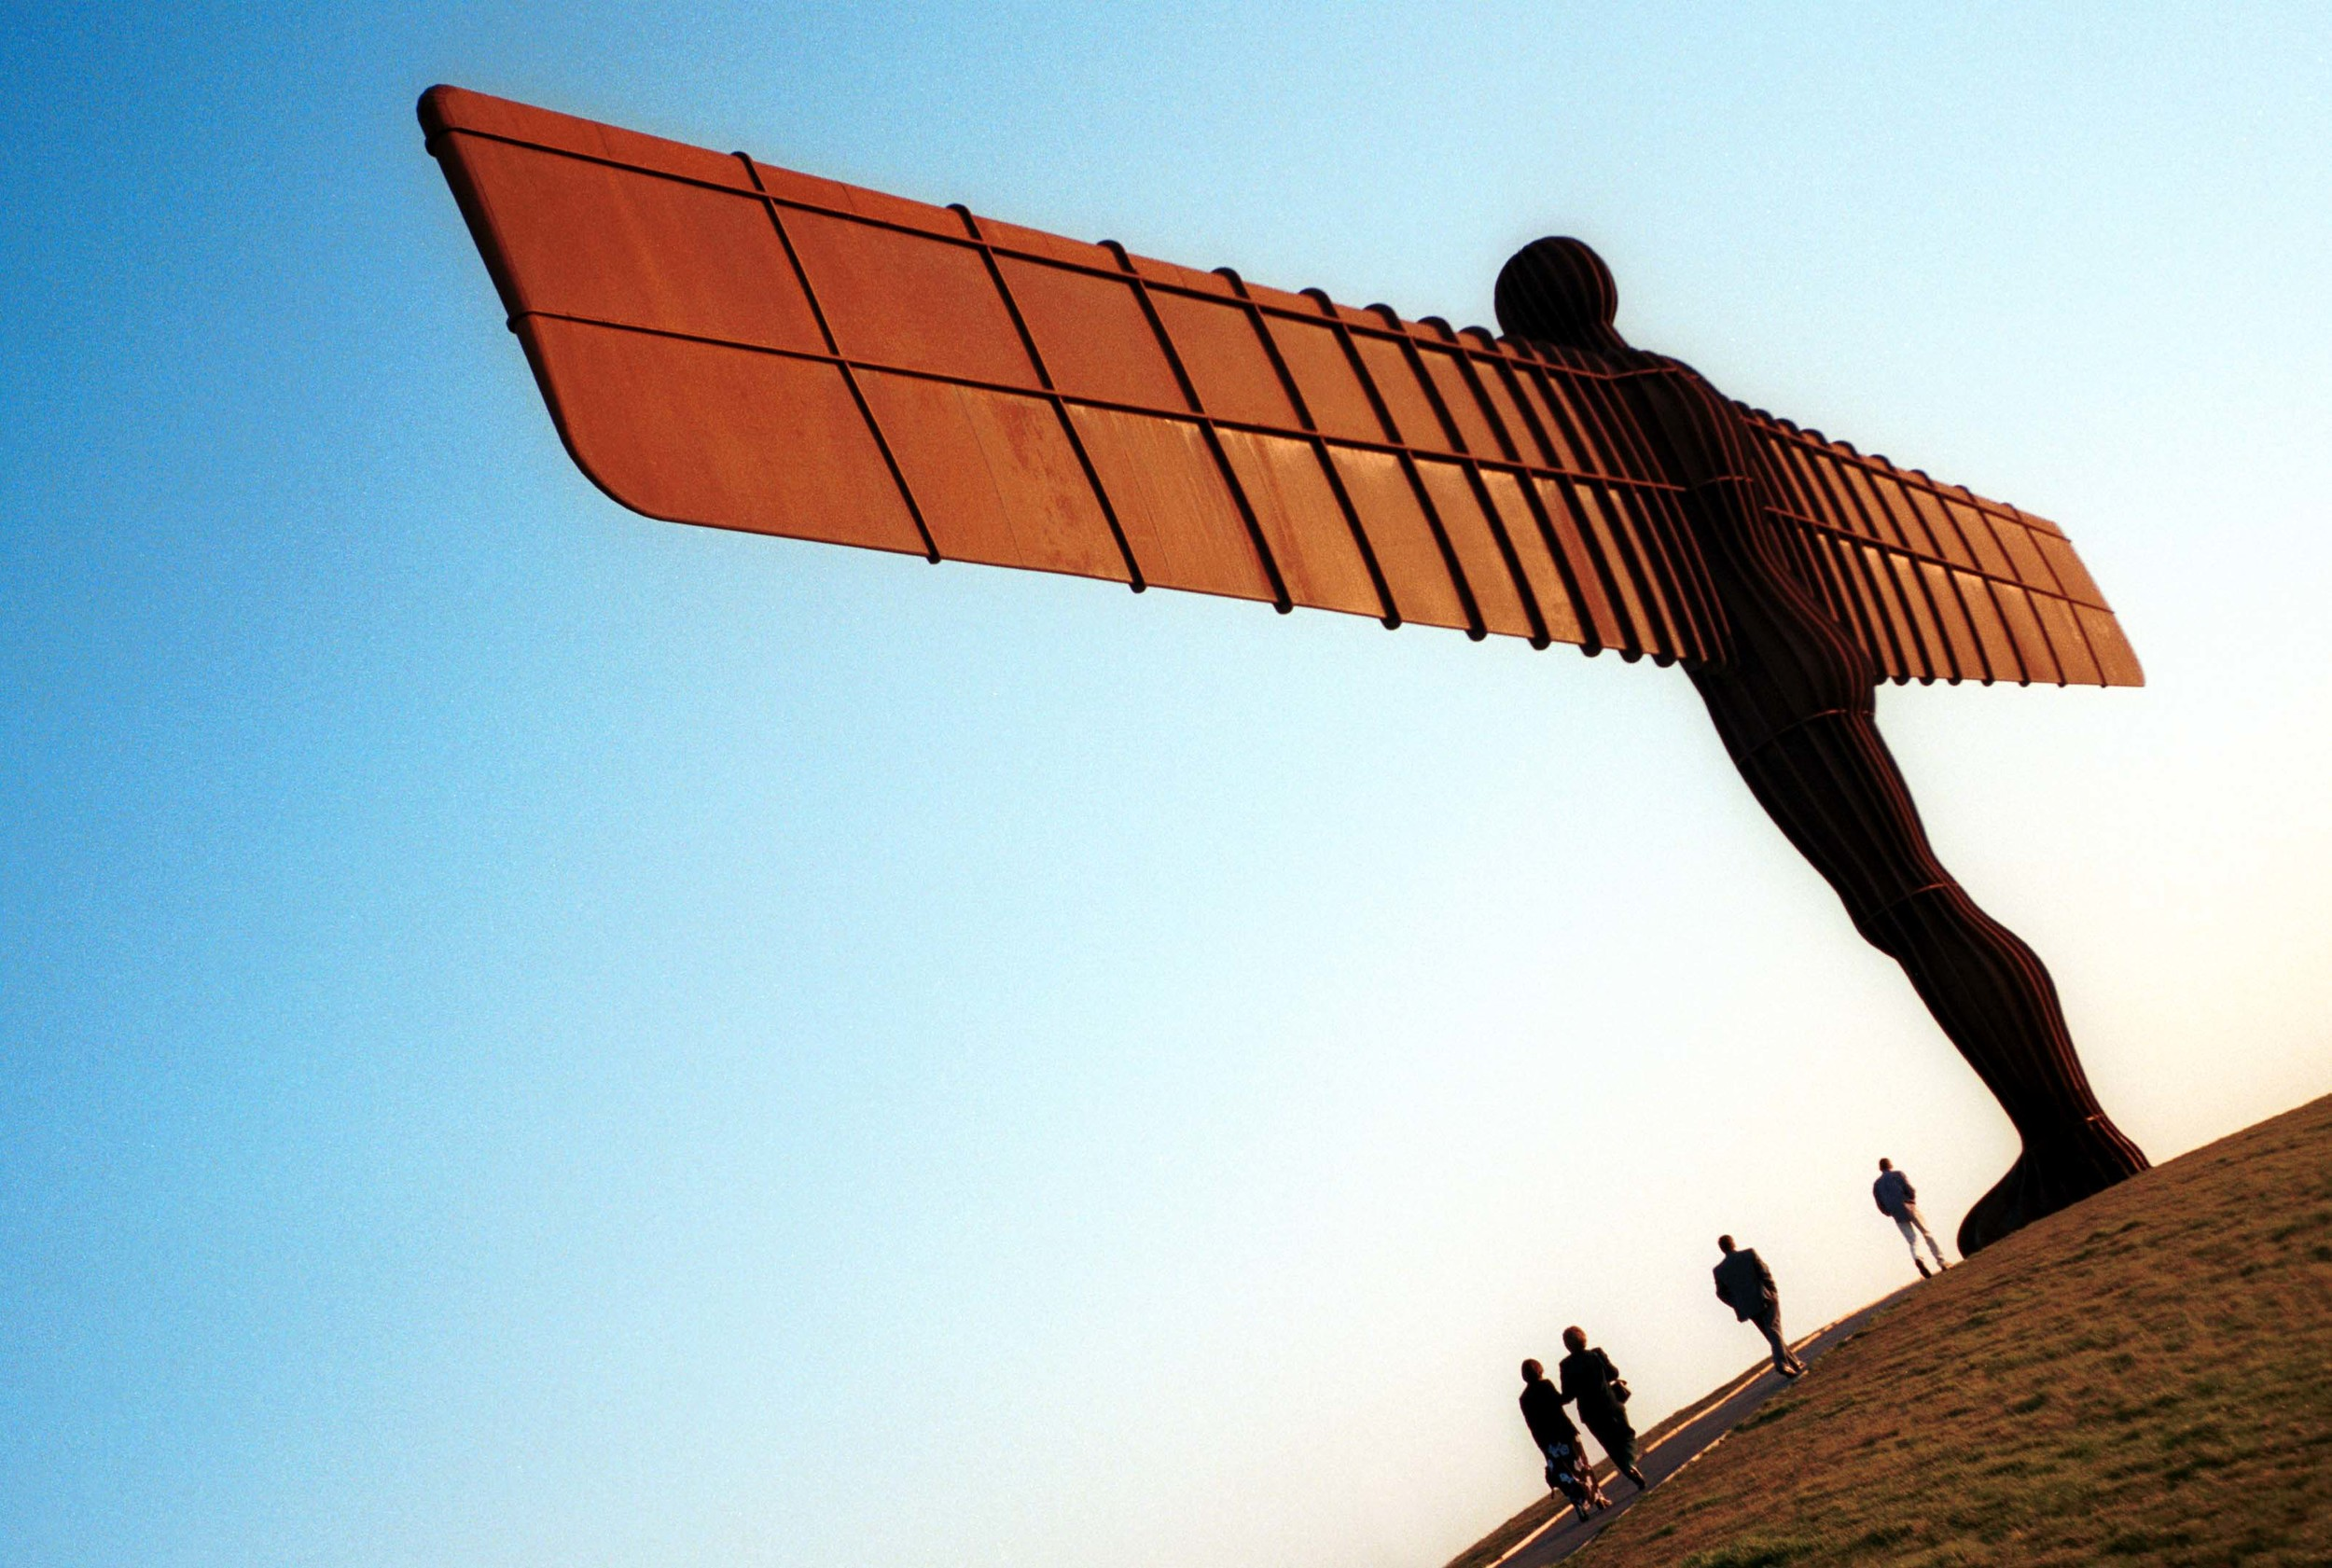 Angel of the North - Gateshead - England